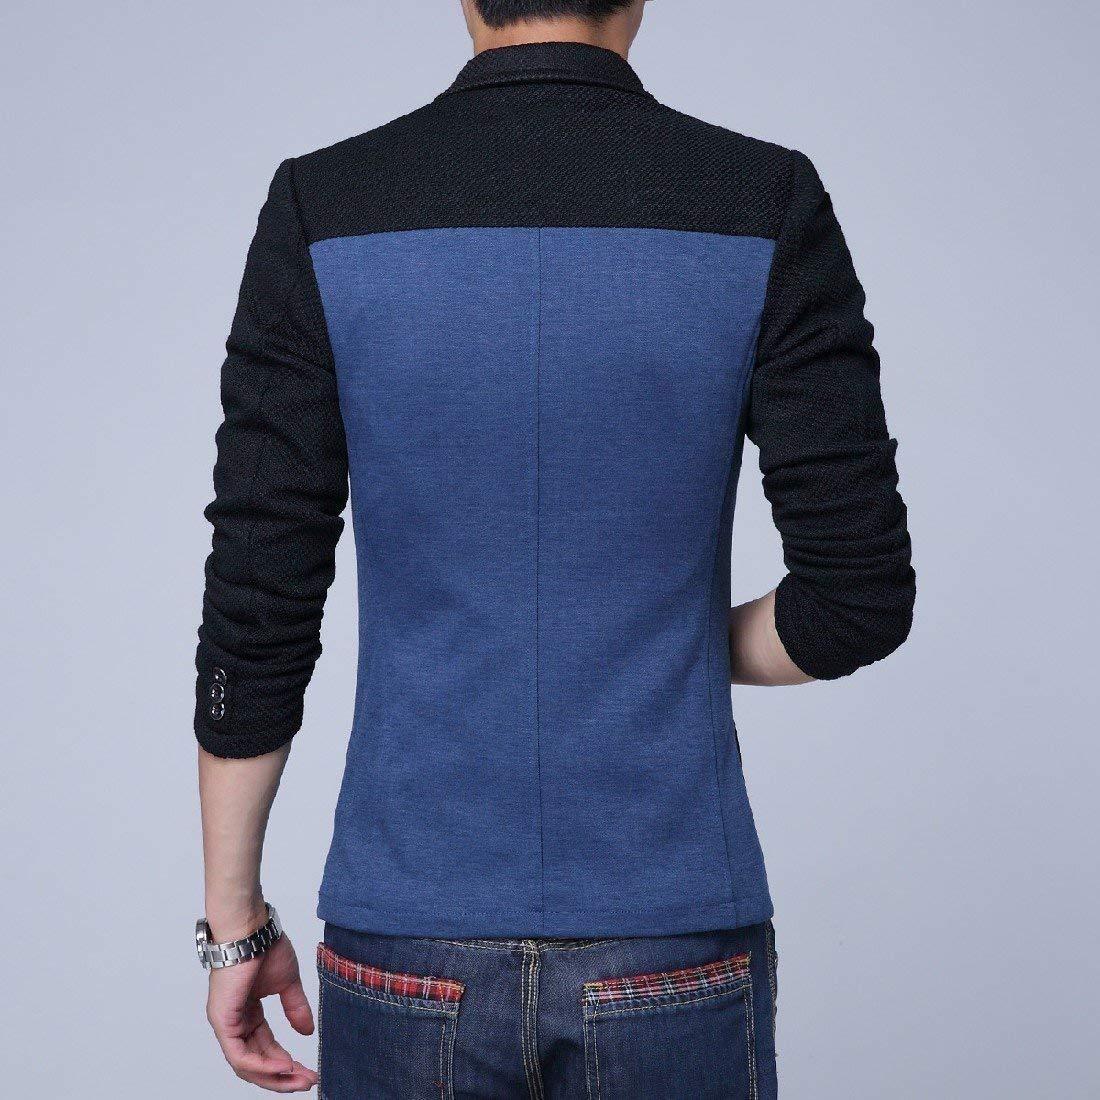 HaiDean Blazer da Uomo Slim Blazer 1 Fit Blazer Casual Moderna Button Suit Giacche Primavera Business Basic Risvolto Casual da Uomo Casual Blazer da Uomo Elegante